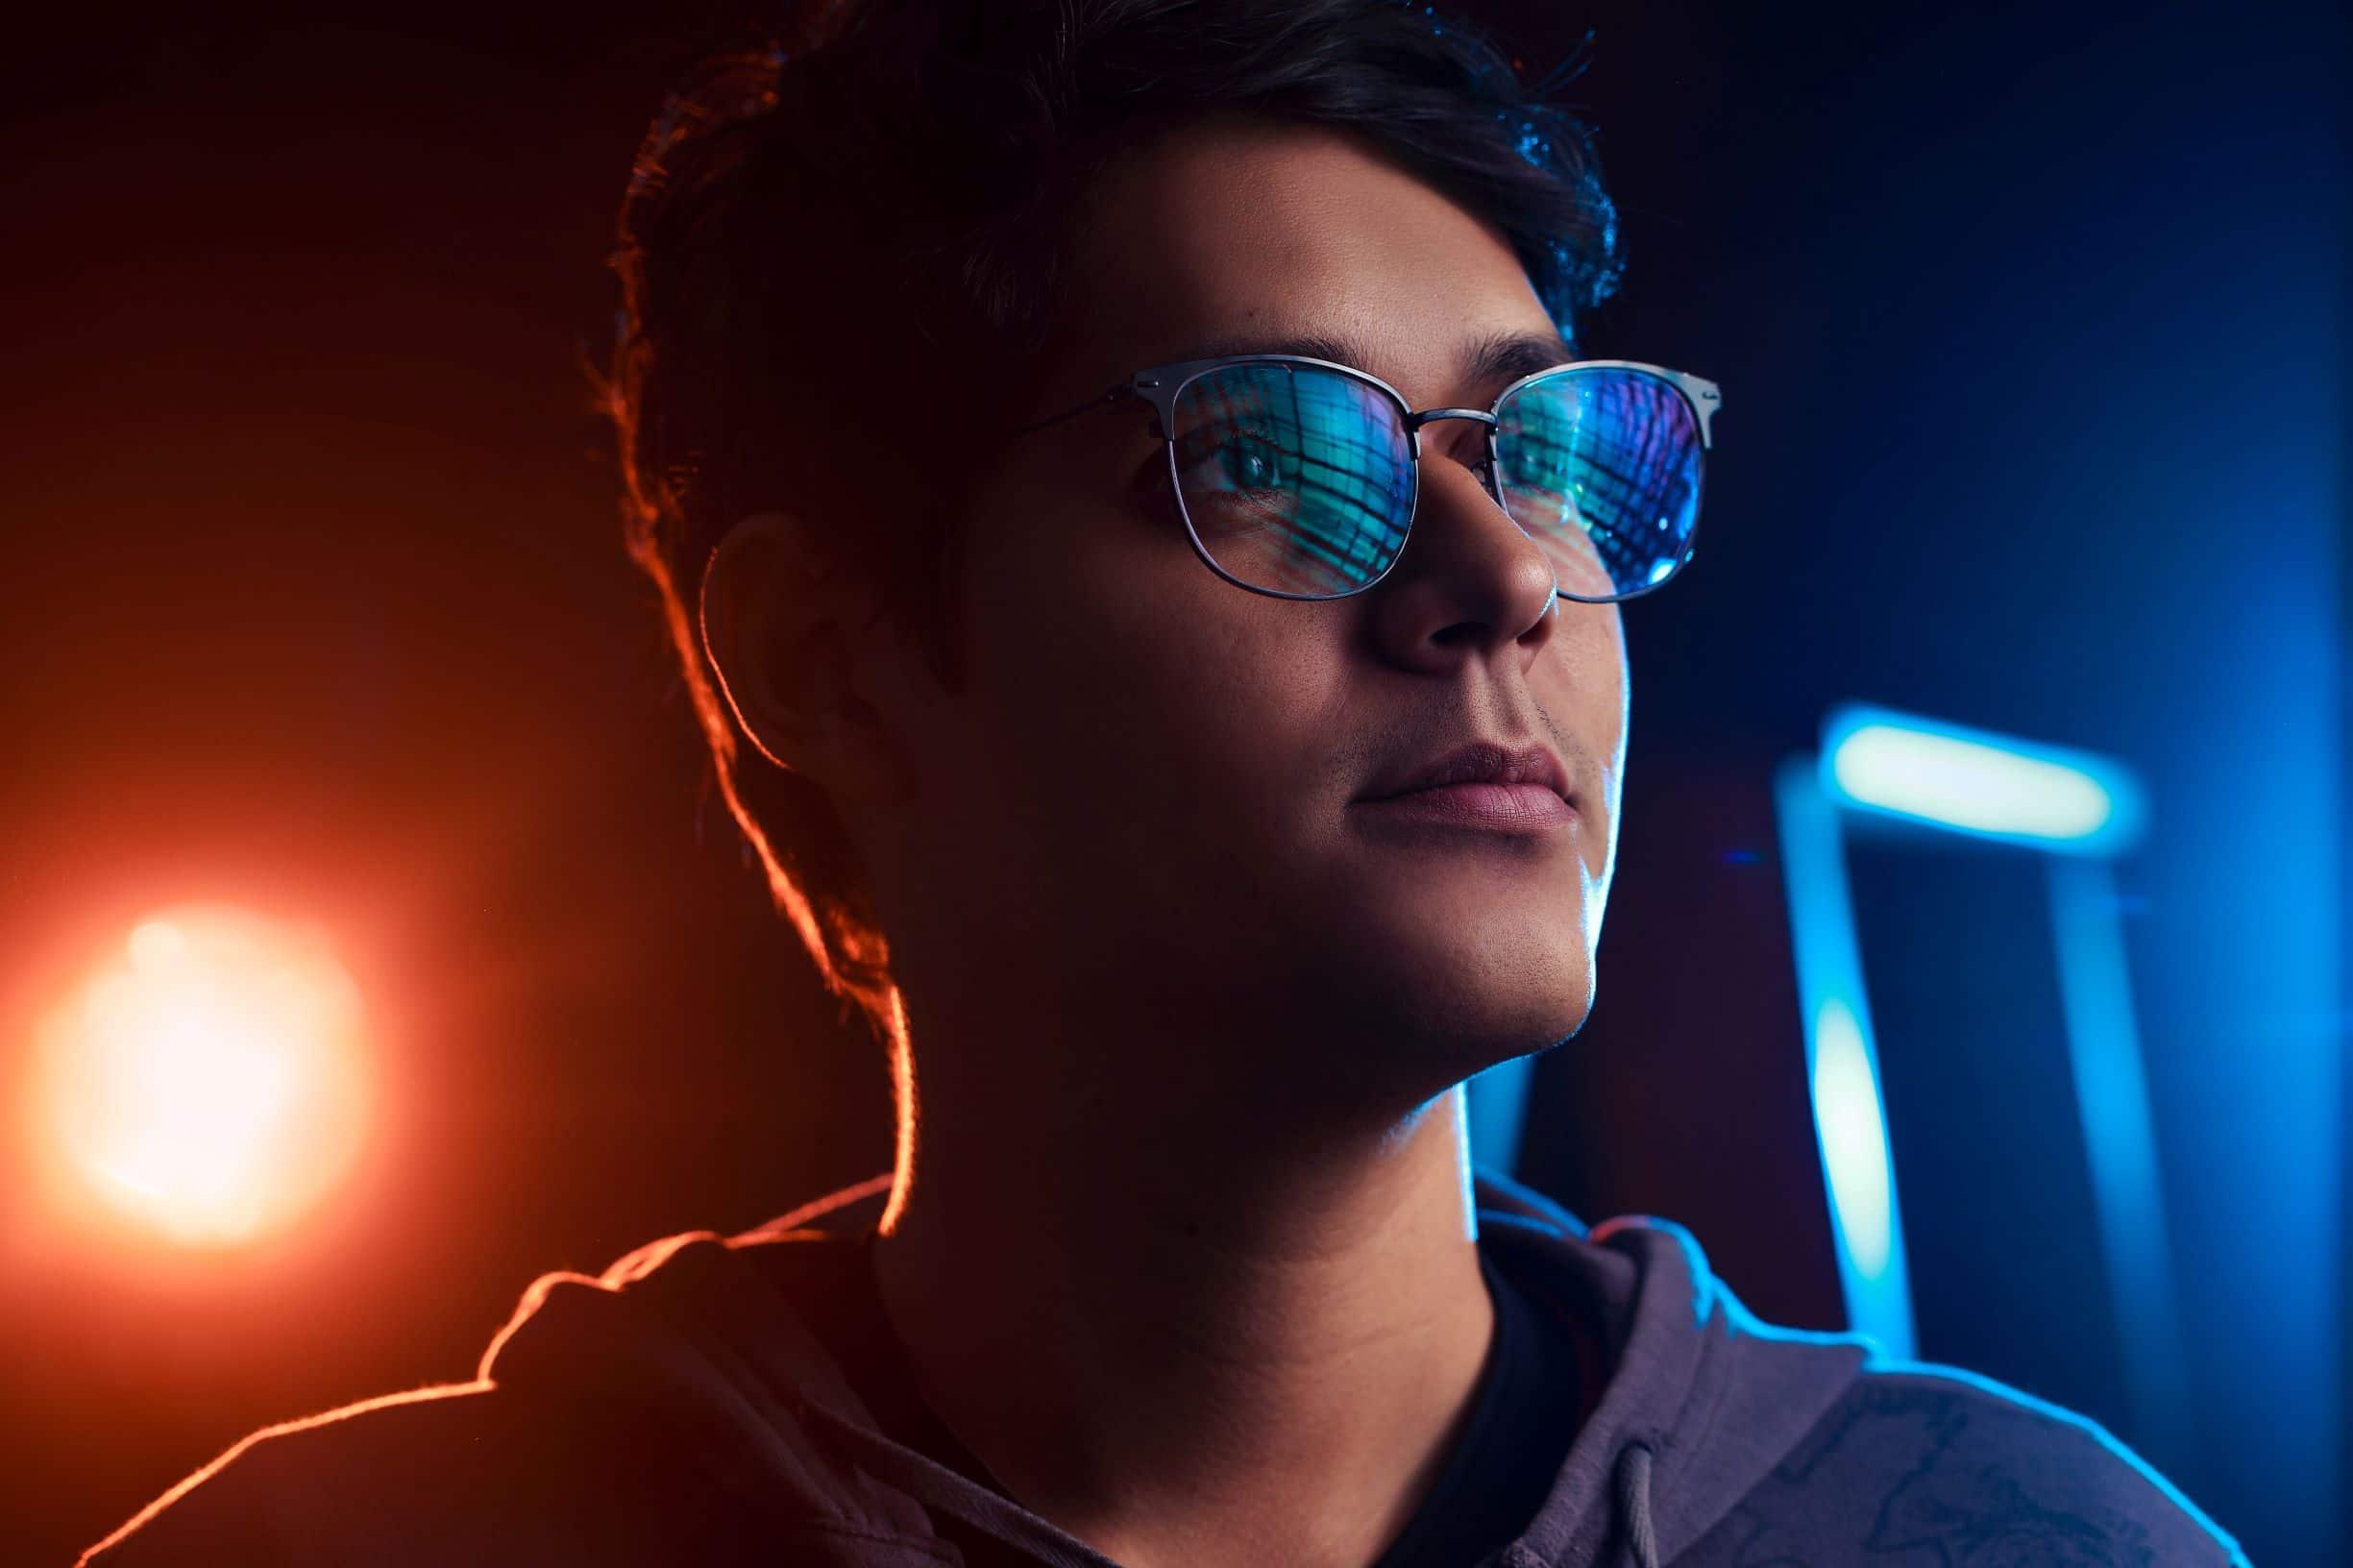 blue light glasses help prevent headaches